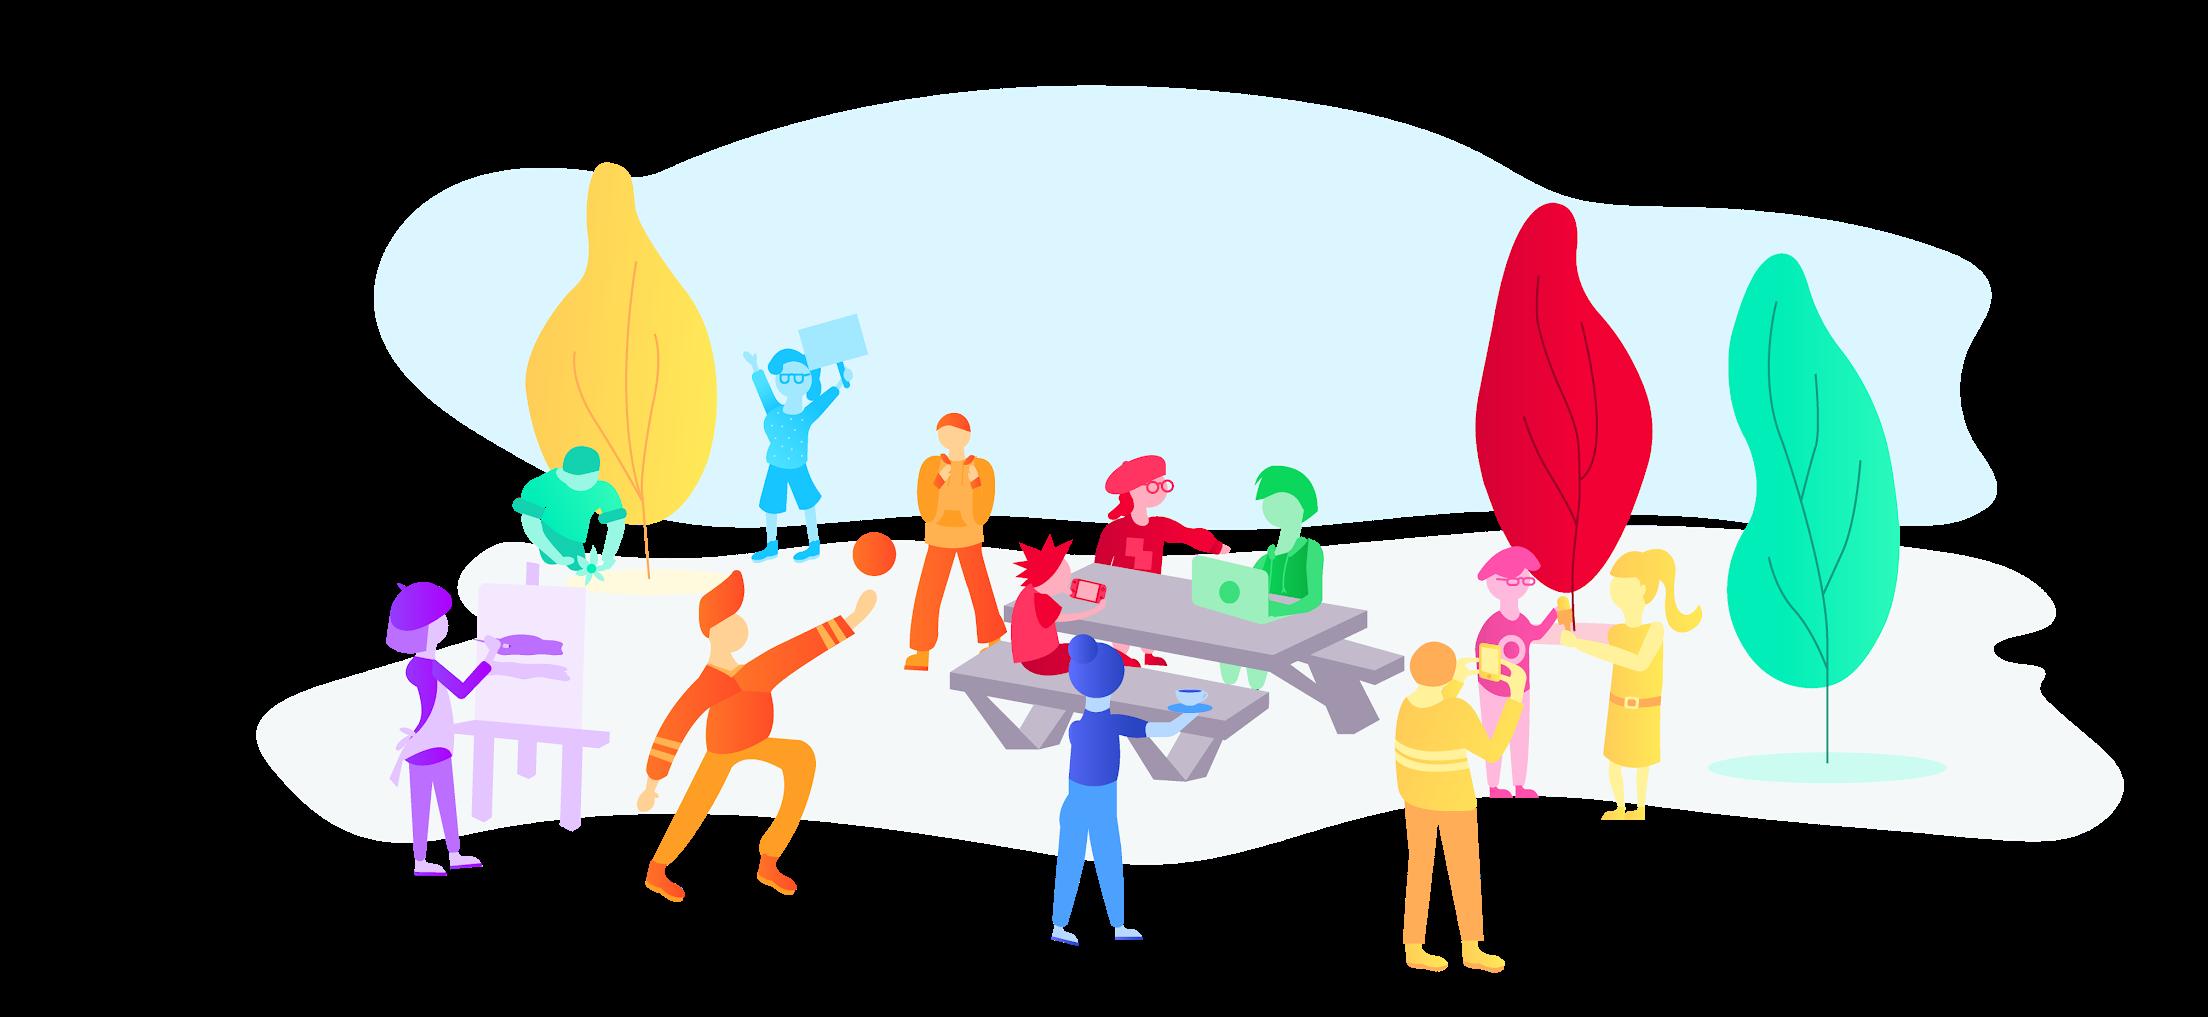 Hackathon Illustration Landing Page (Col